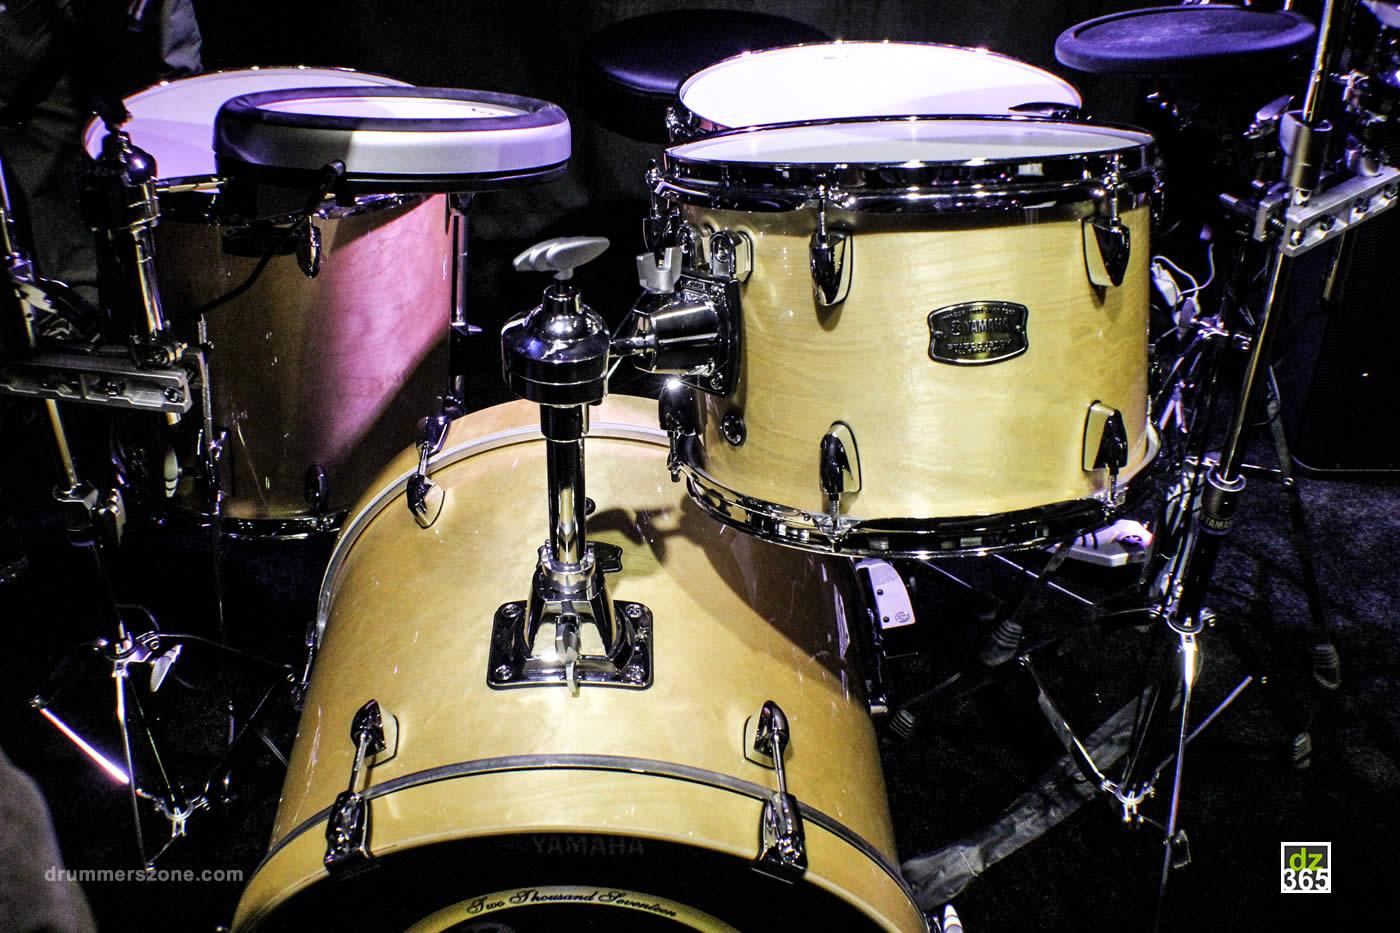 Drummerszone news - Yamaha DT50 Drum Triggers at NAMM 2017